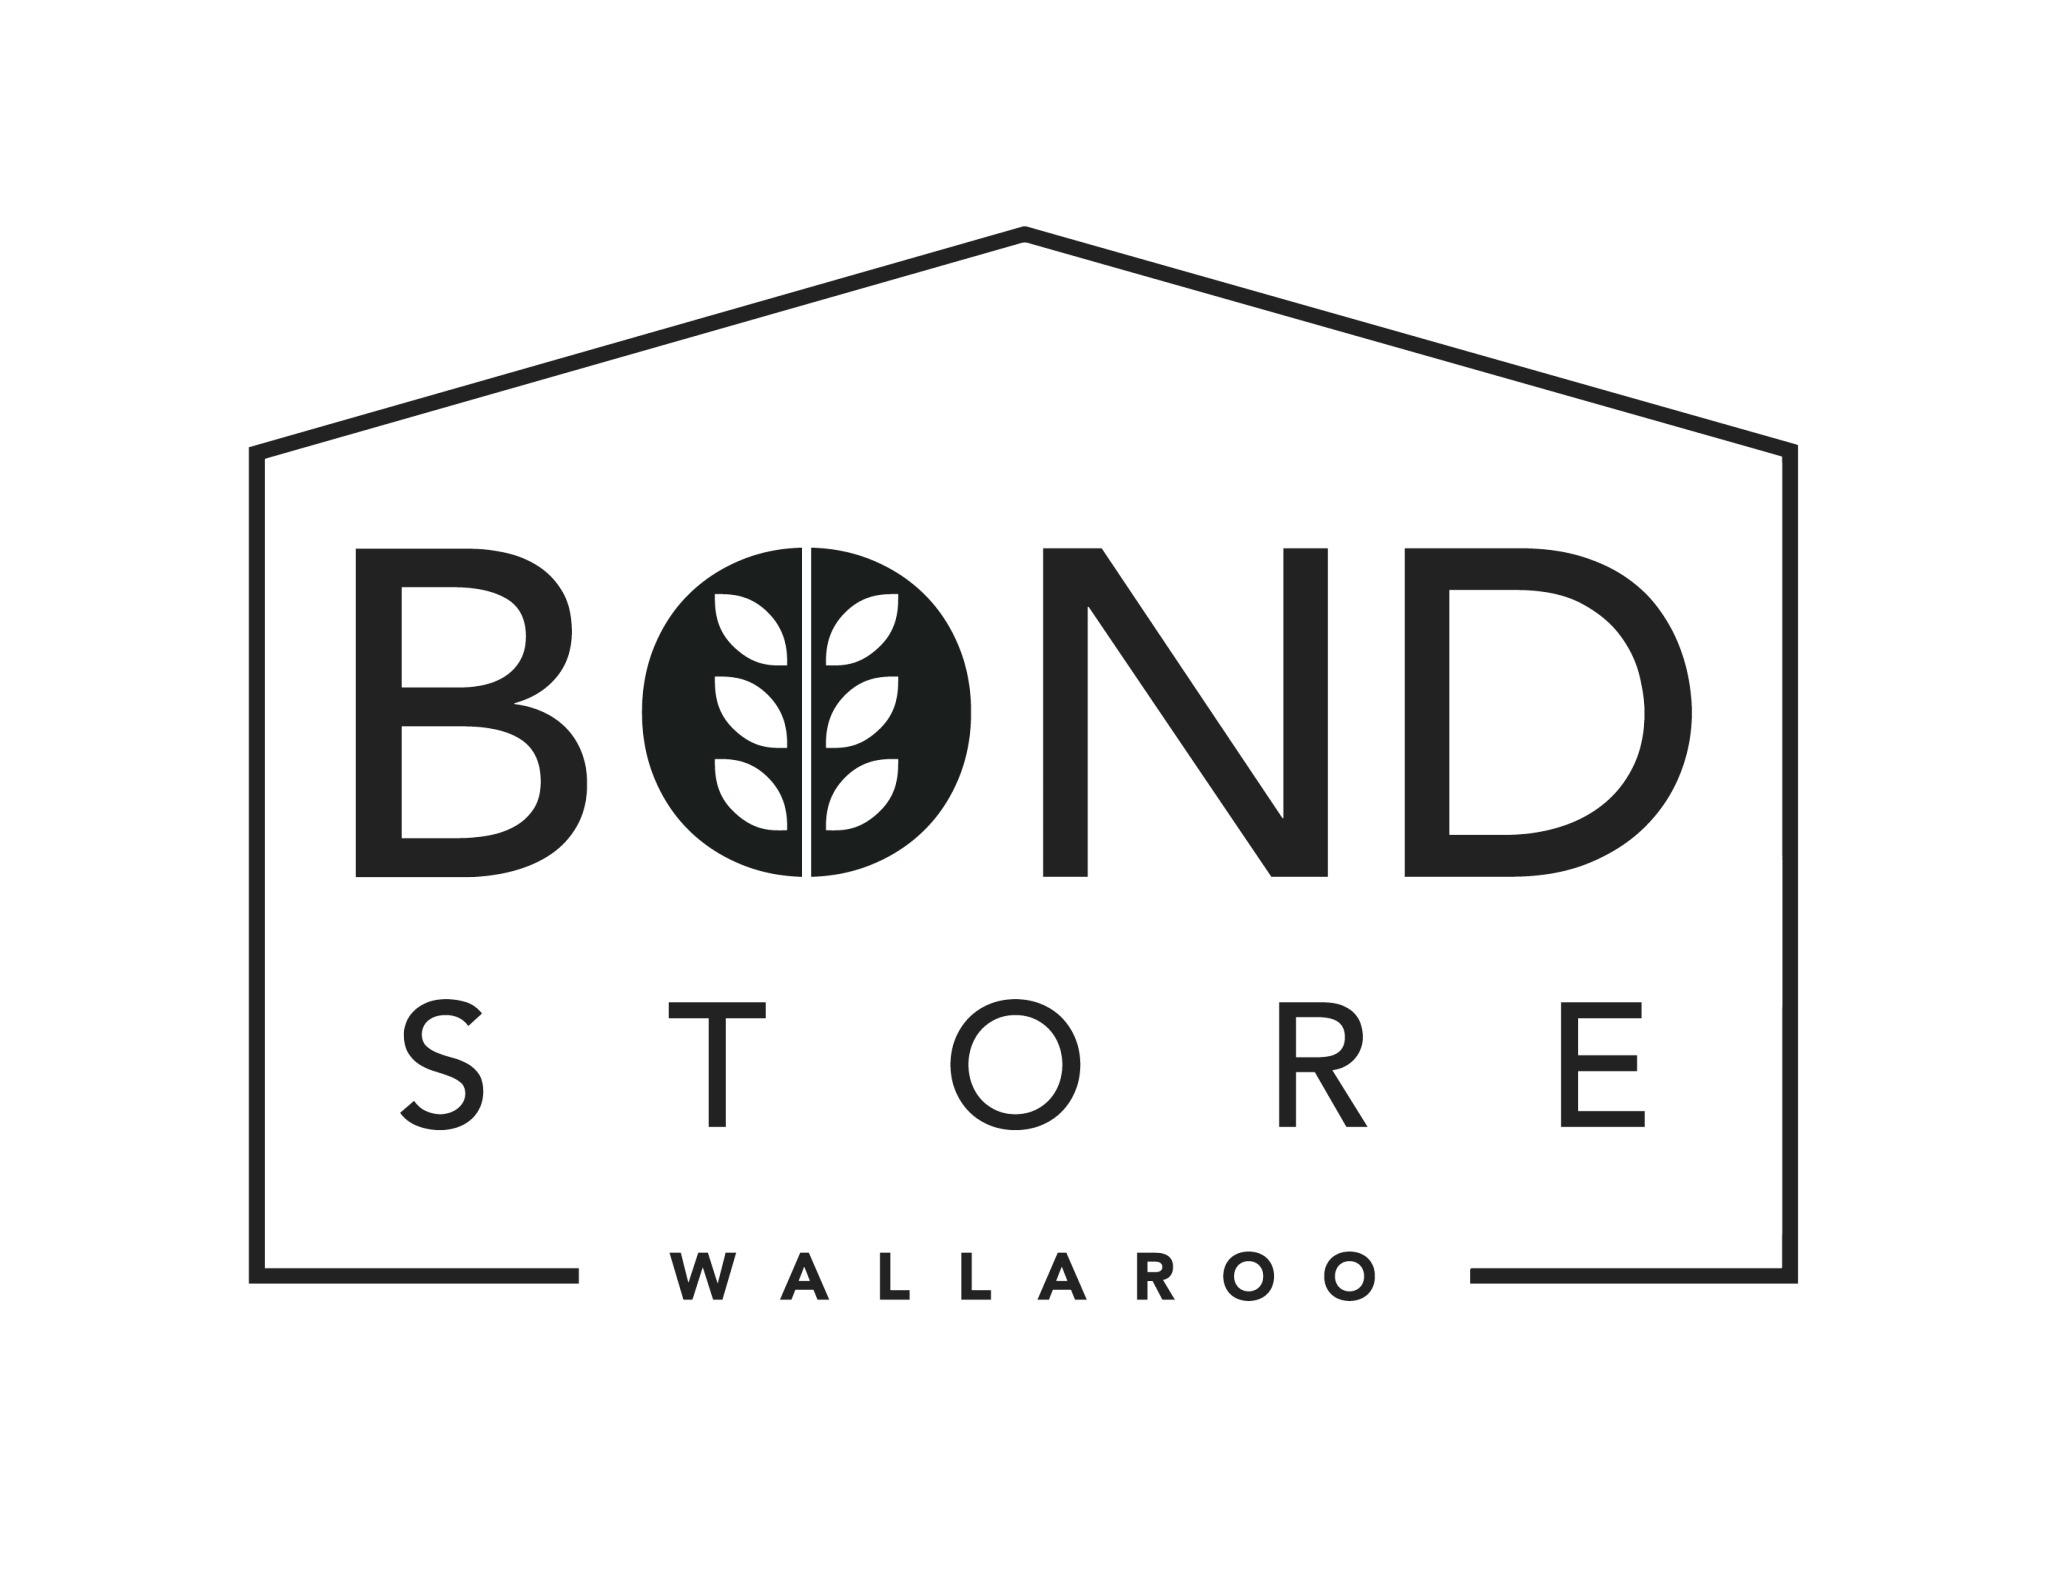 Bond Store Wallaroo